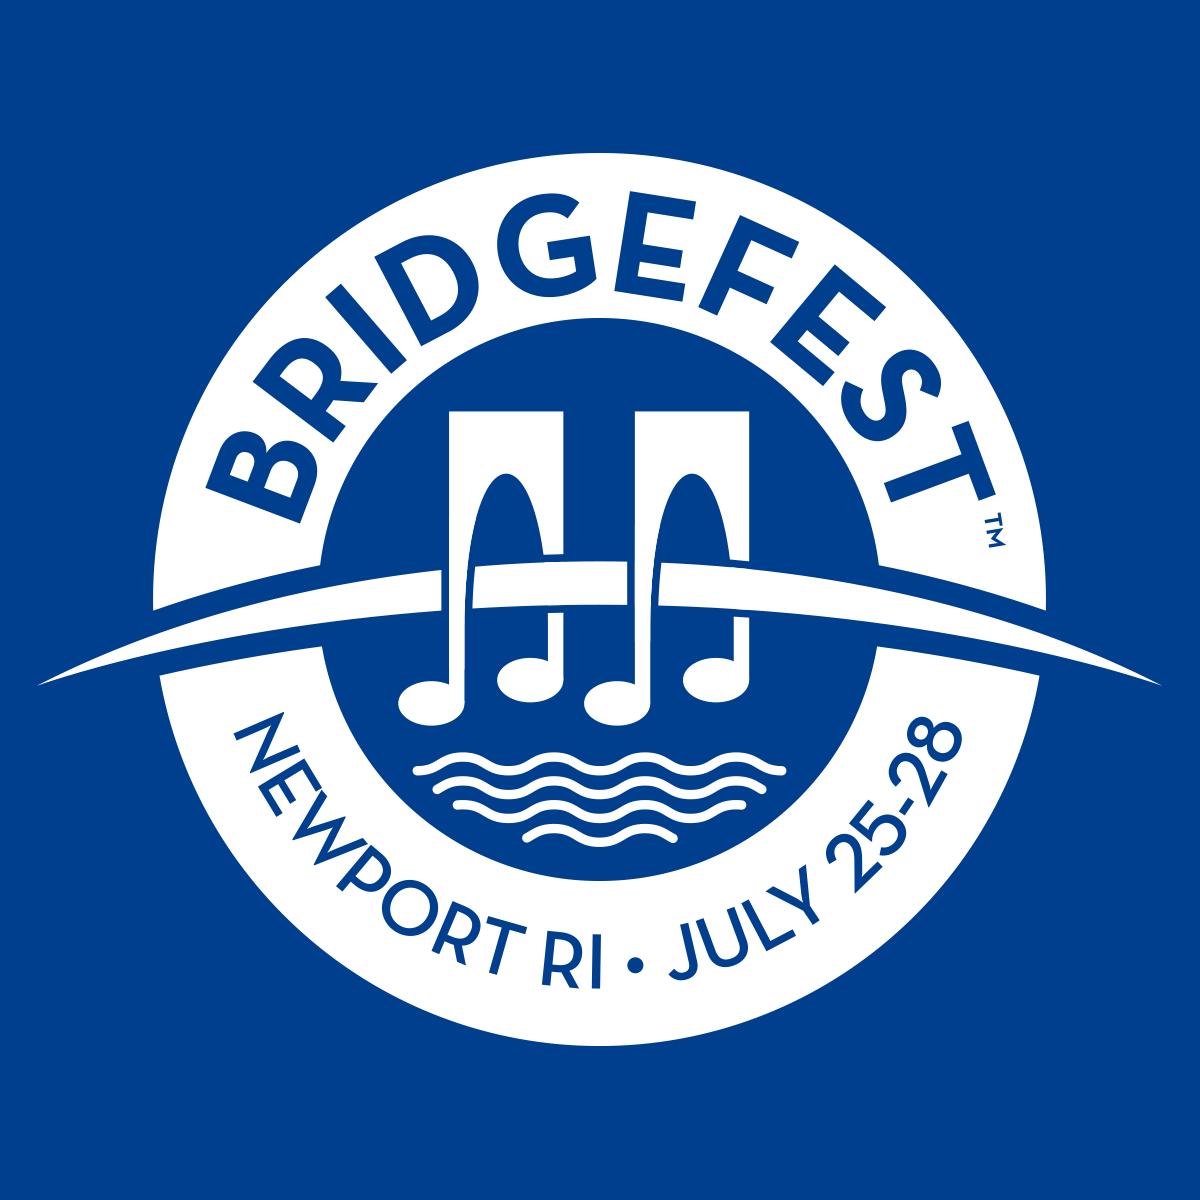 Newport Bridgefest